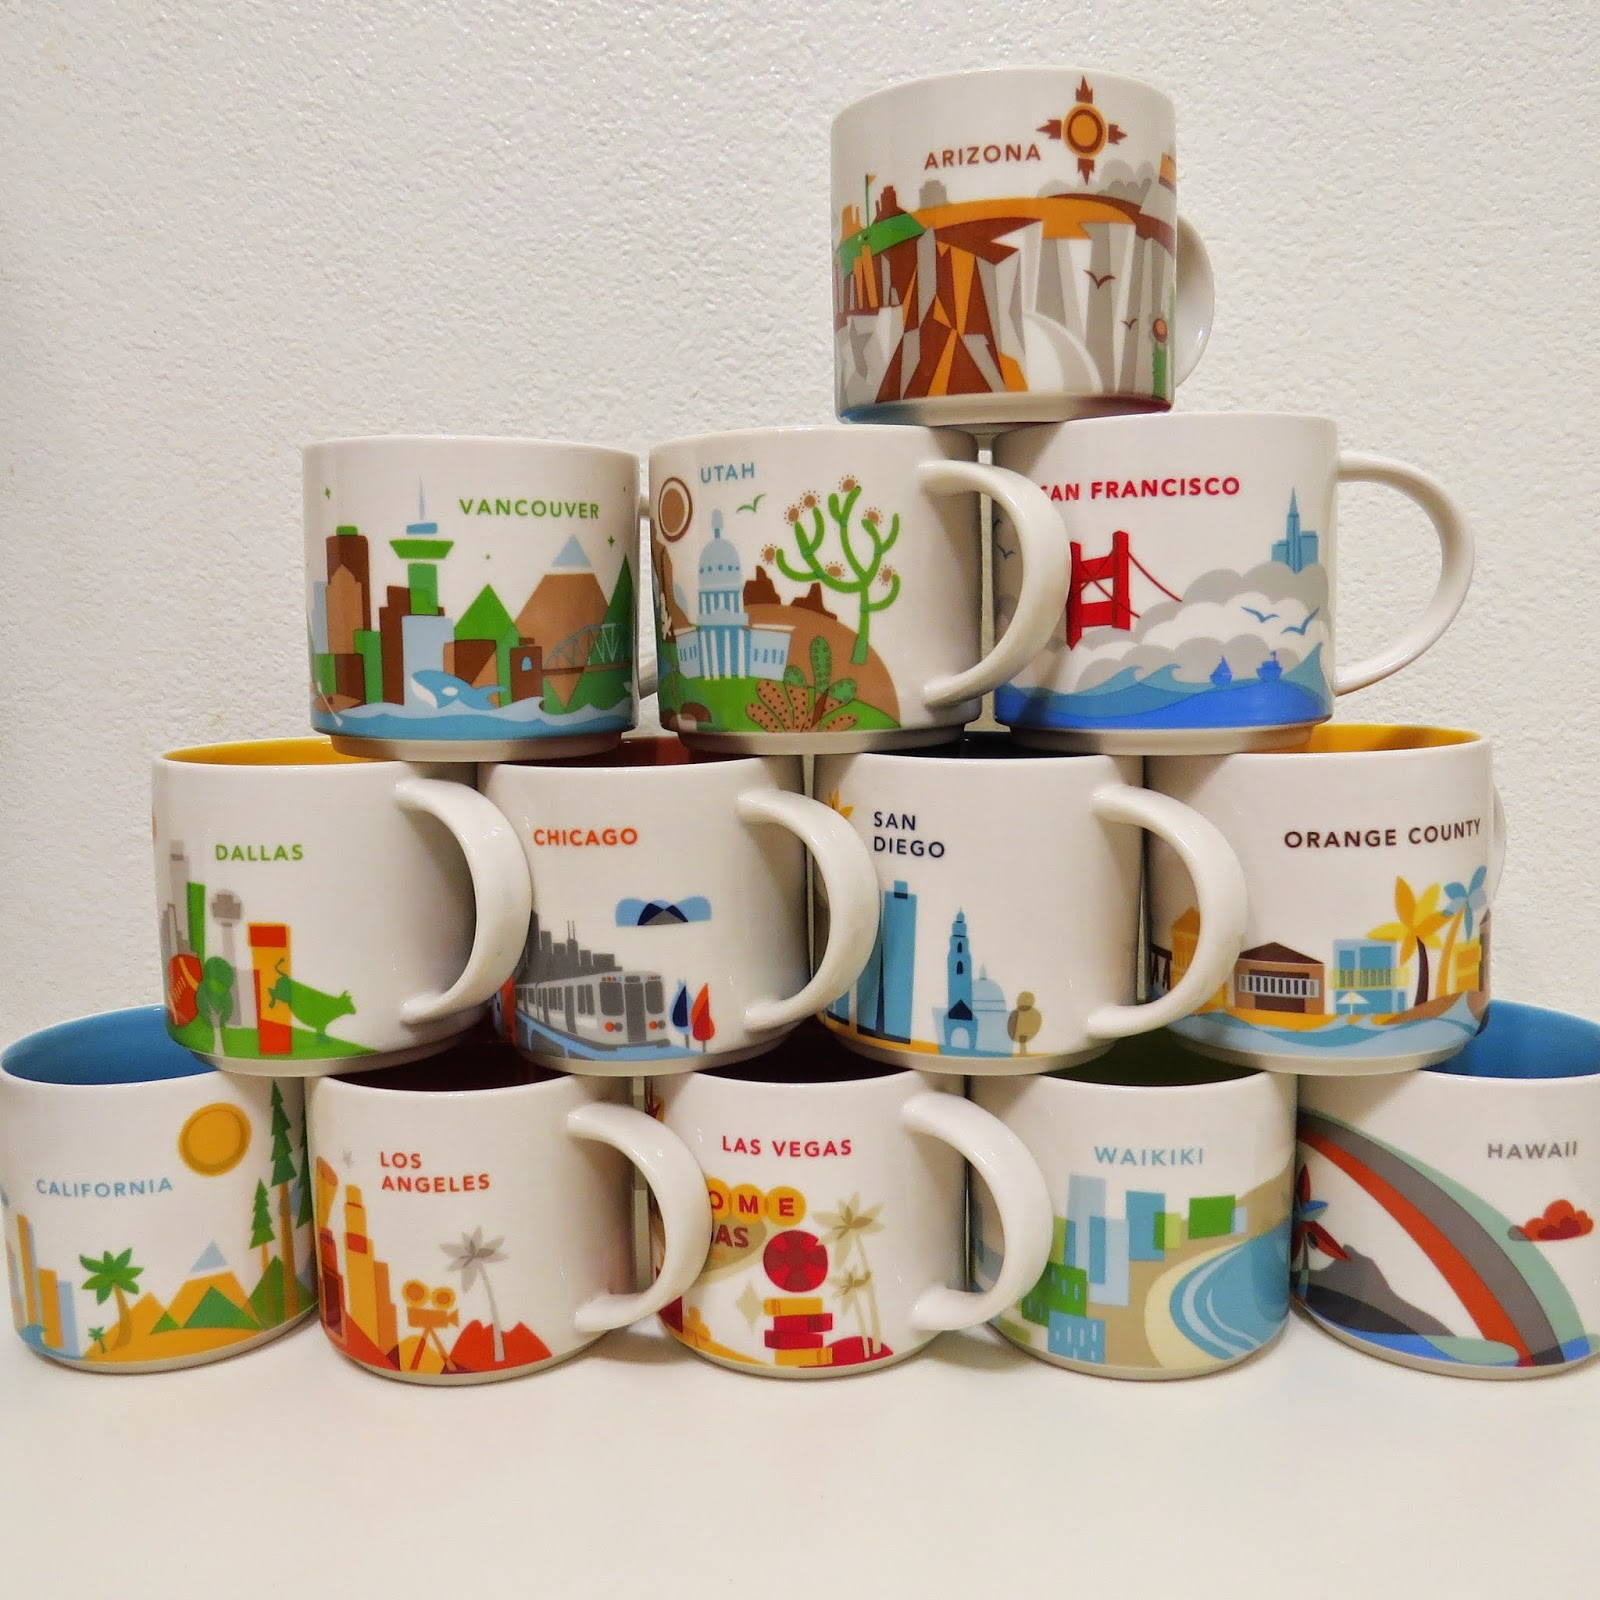 Image Result For Starbucks Espresso Mugs